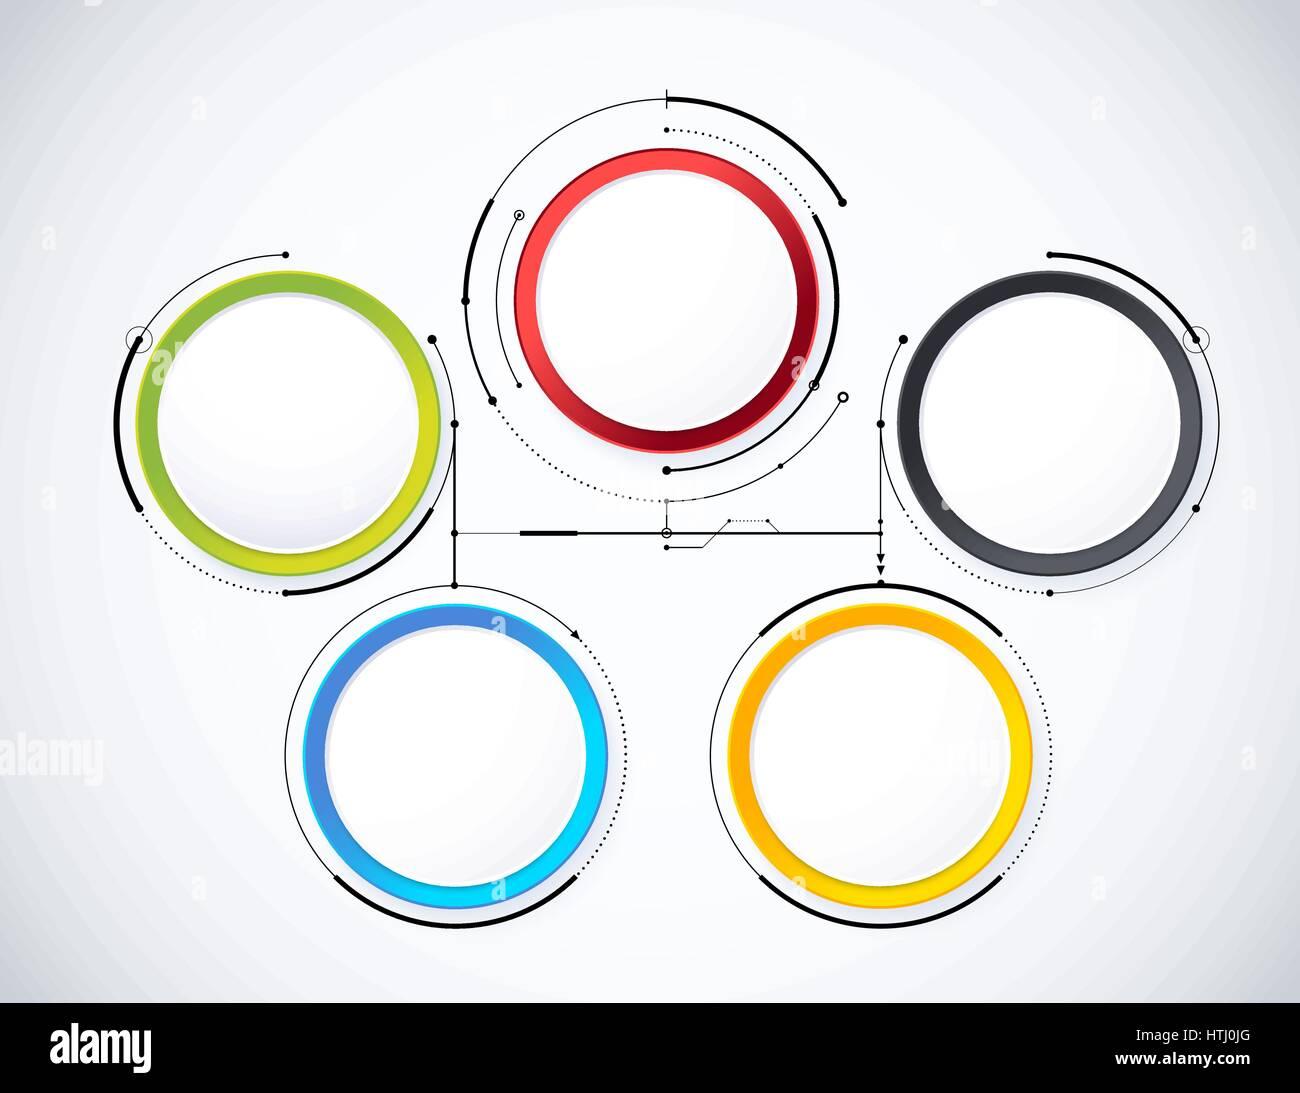 Digital diagram style diagram and flow chart of technology concept diagram and flow chart of technology concept presentation vector illustration nvjuhfo Choice Image